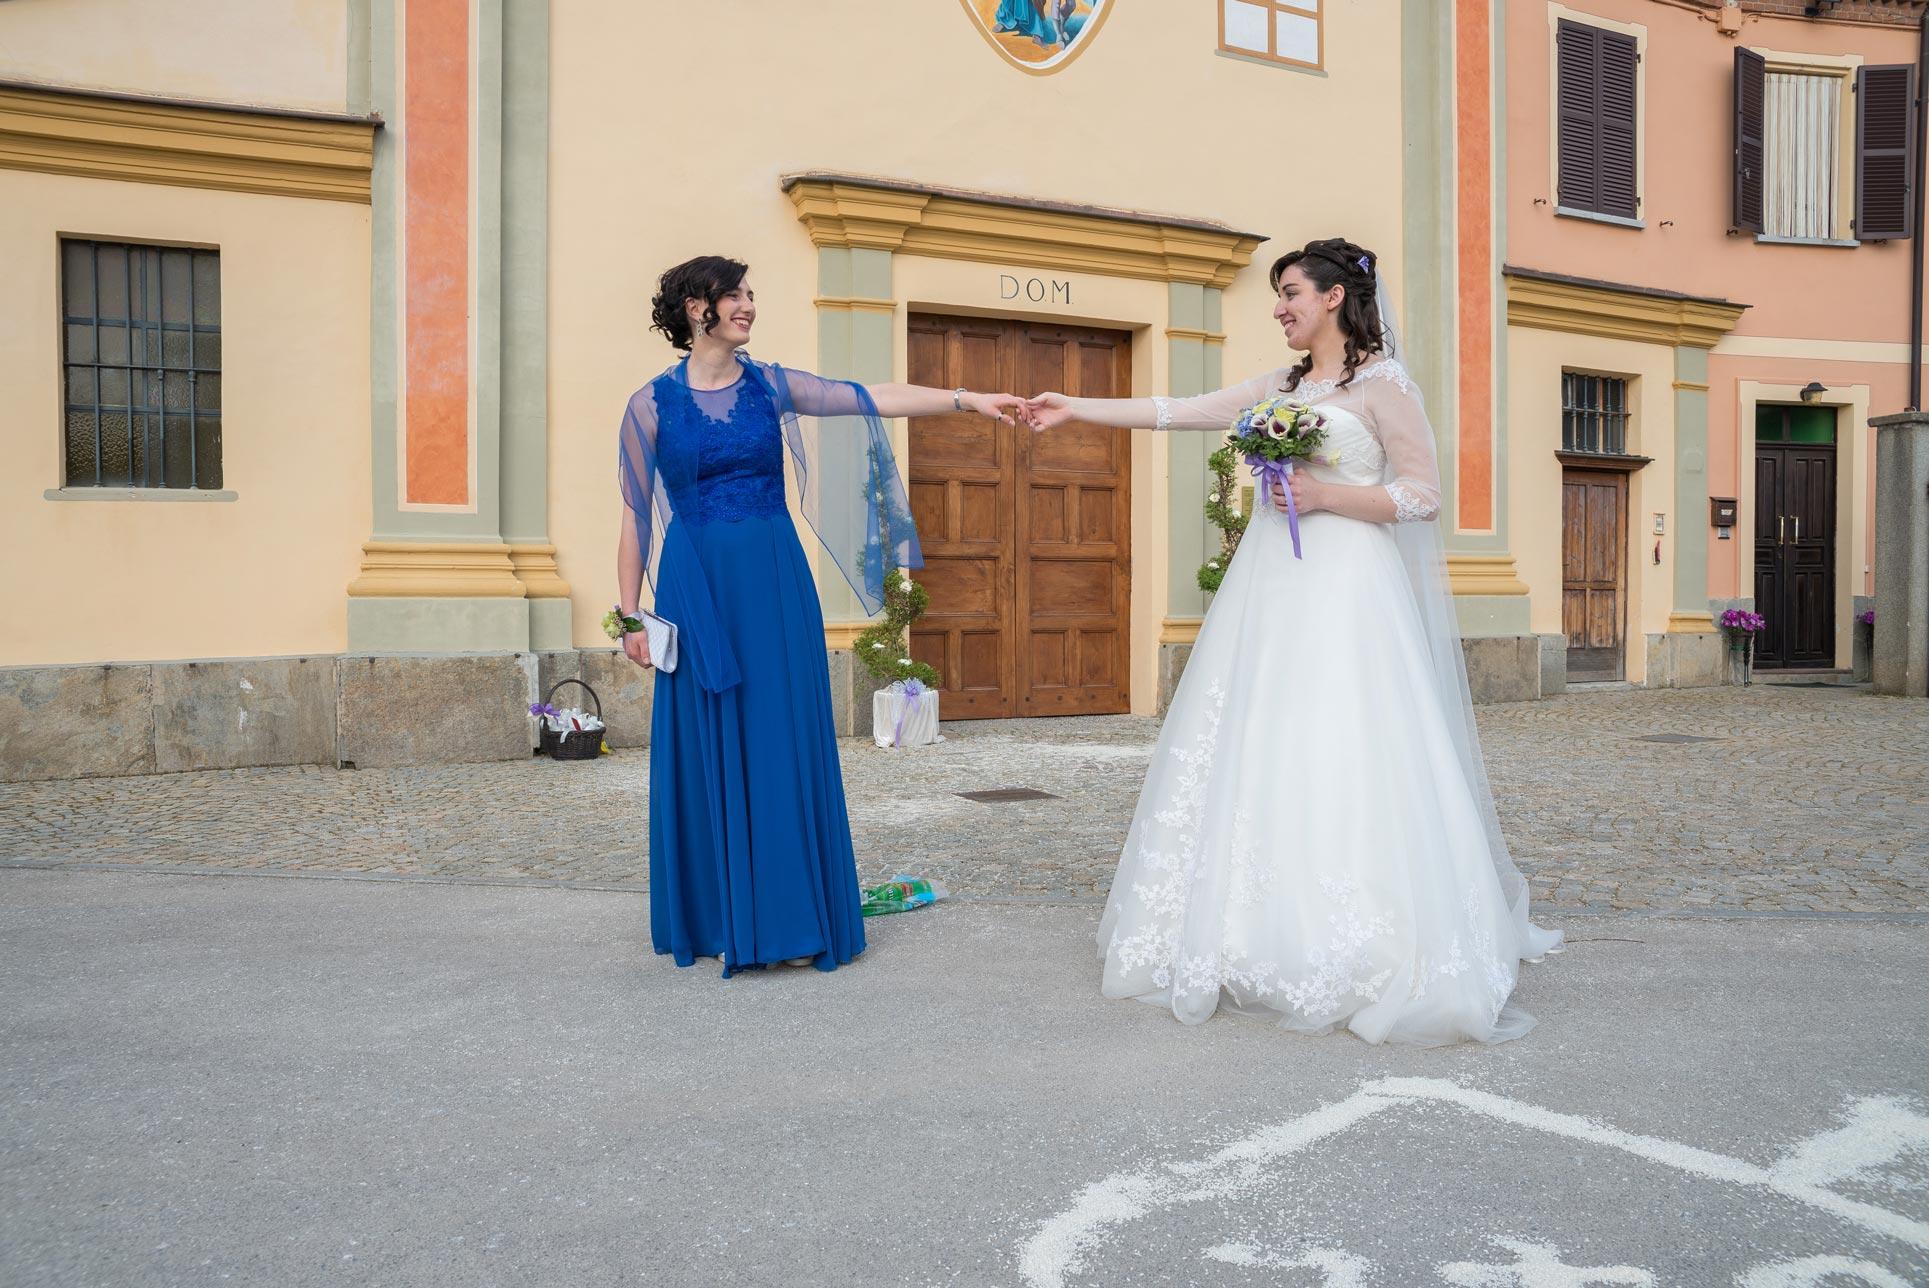 Matrimonio a Narzole Lorenza Diego - DSC 3170 - Fotografie matrimonio testimoni - Fotografie matrimonio testimoni